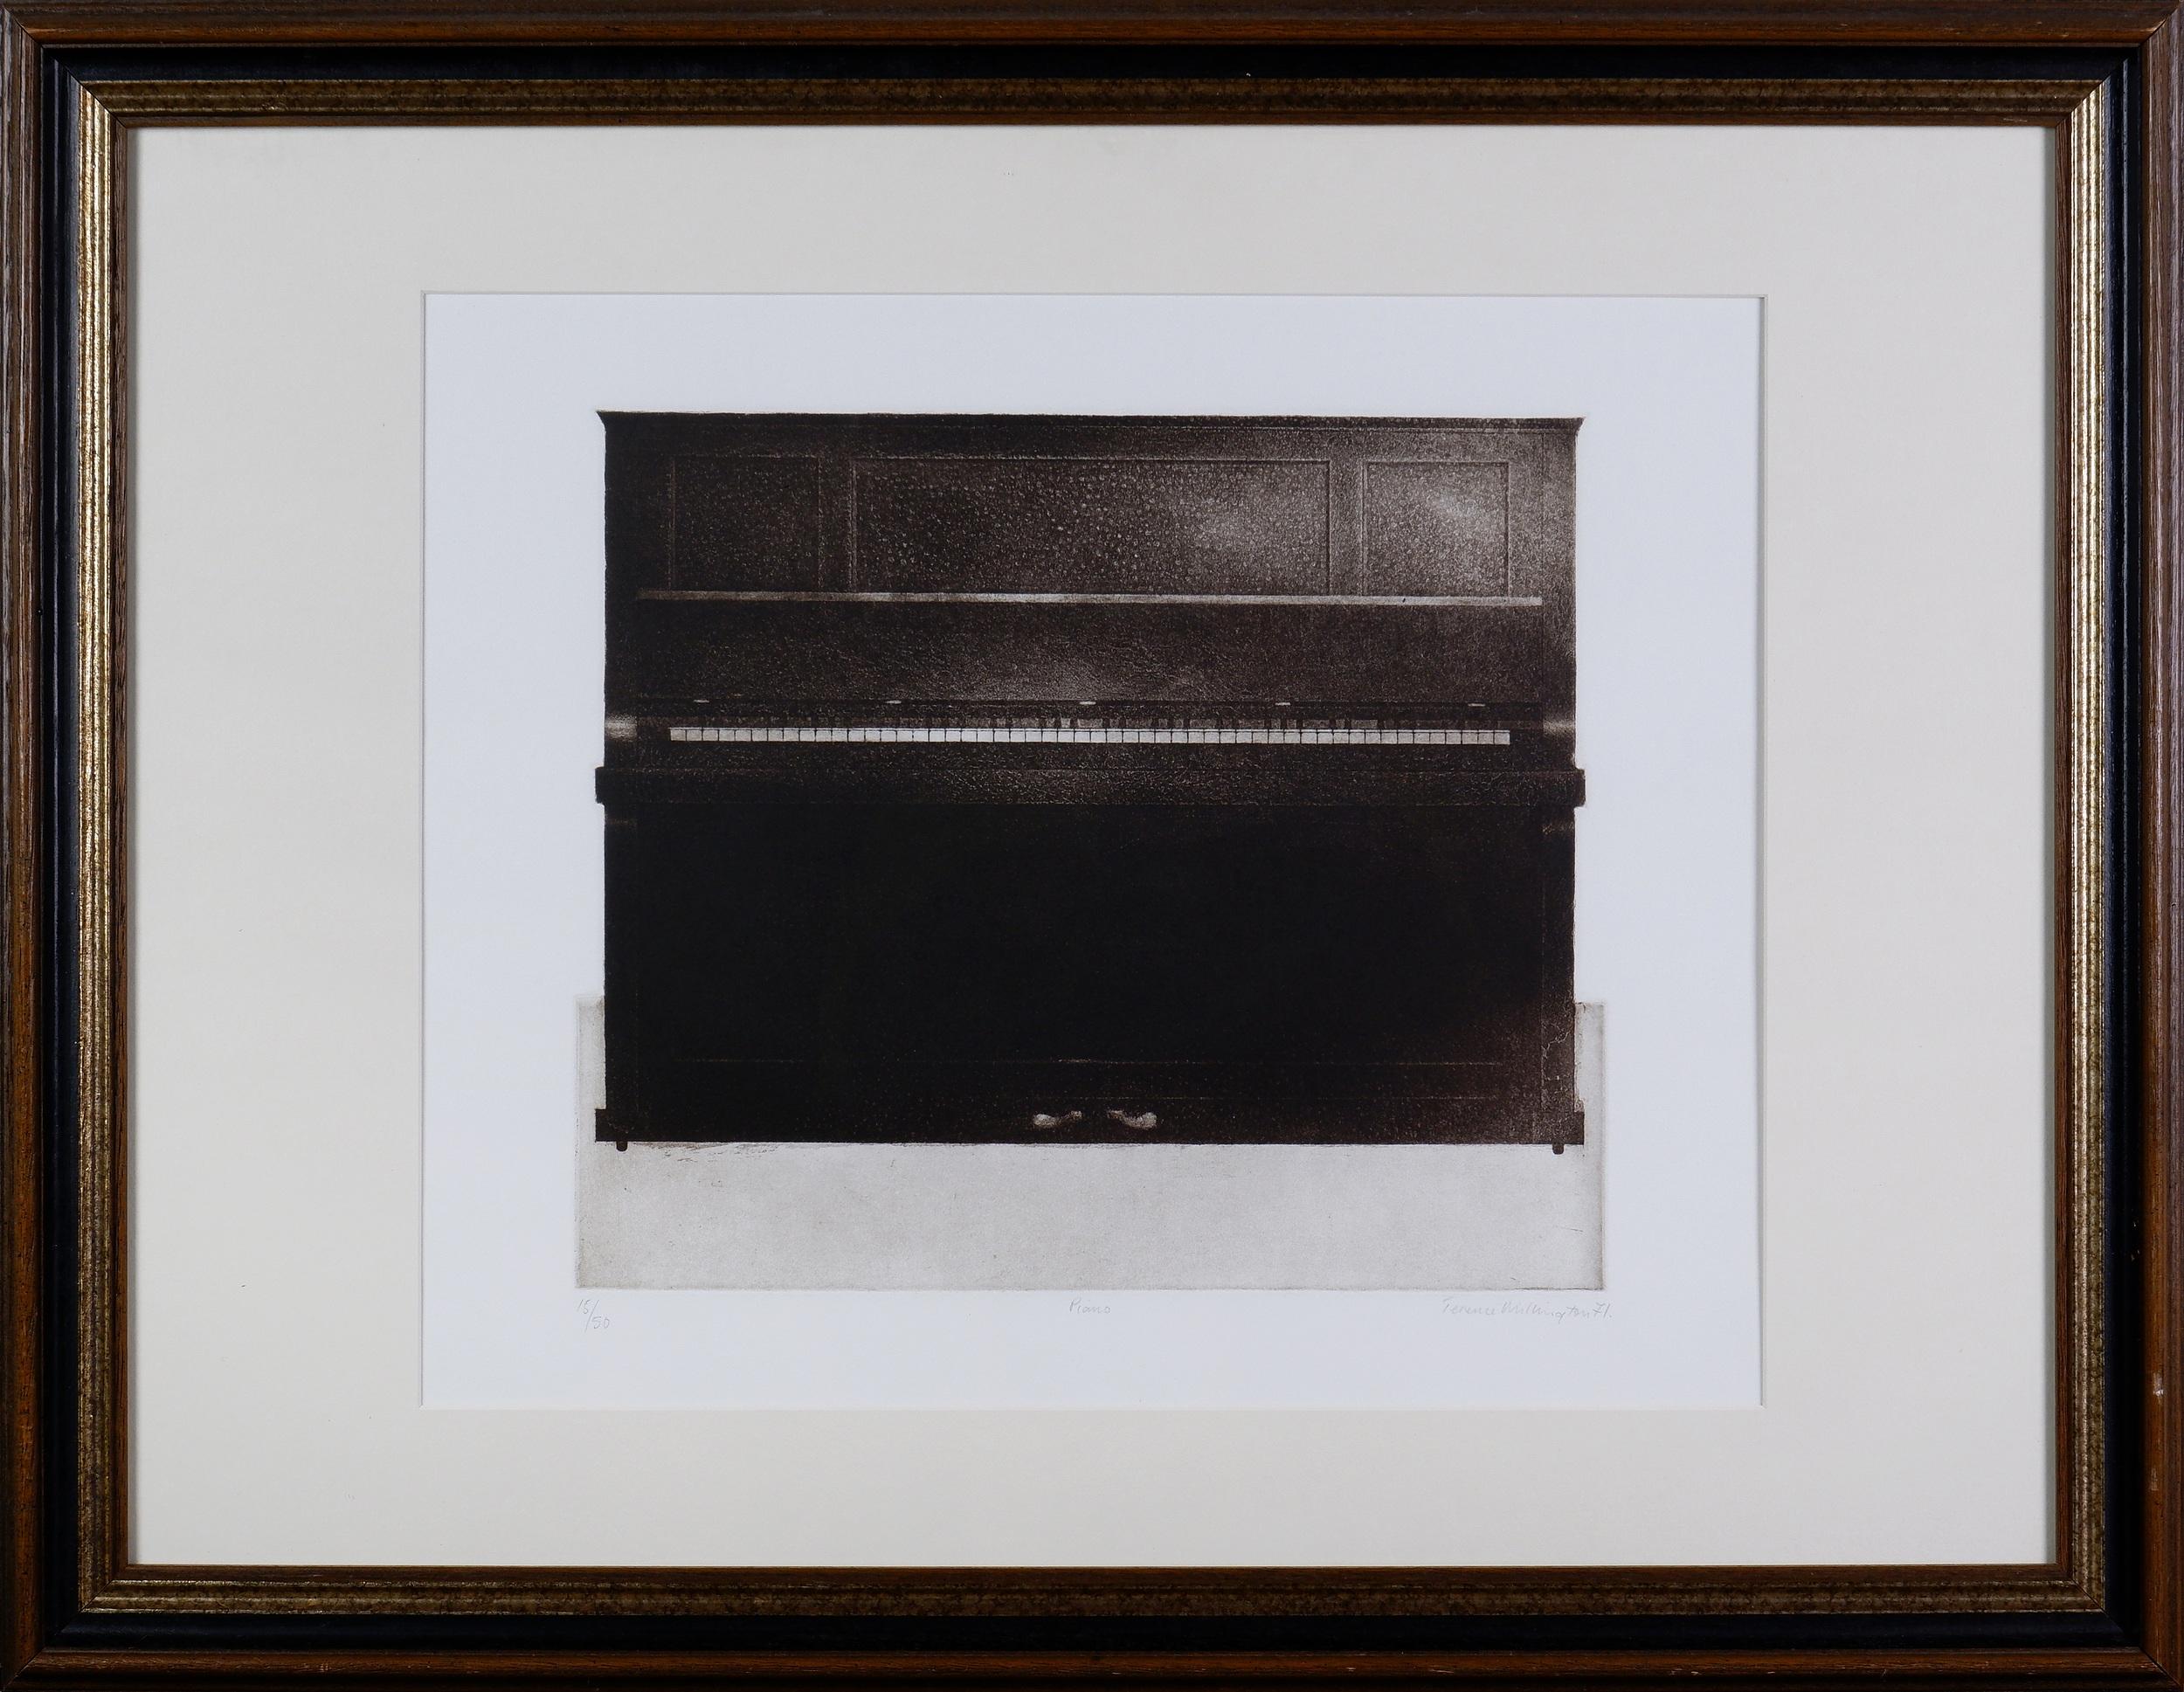 'Terence Millington (born 1943, British), Piano 1971, Etching & Aquatint Edition 16/50, 37.5 x 28 cm (image size)'